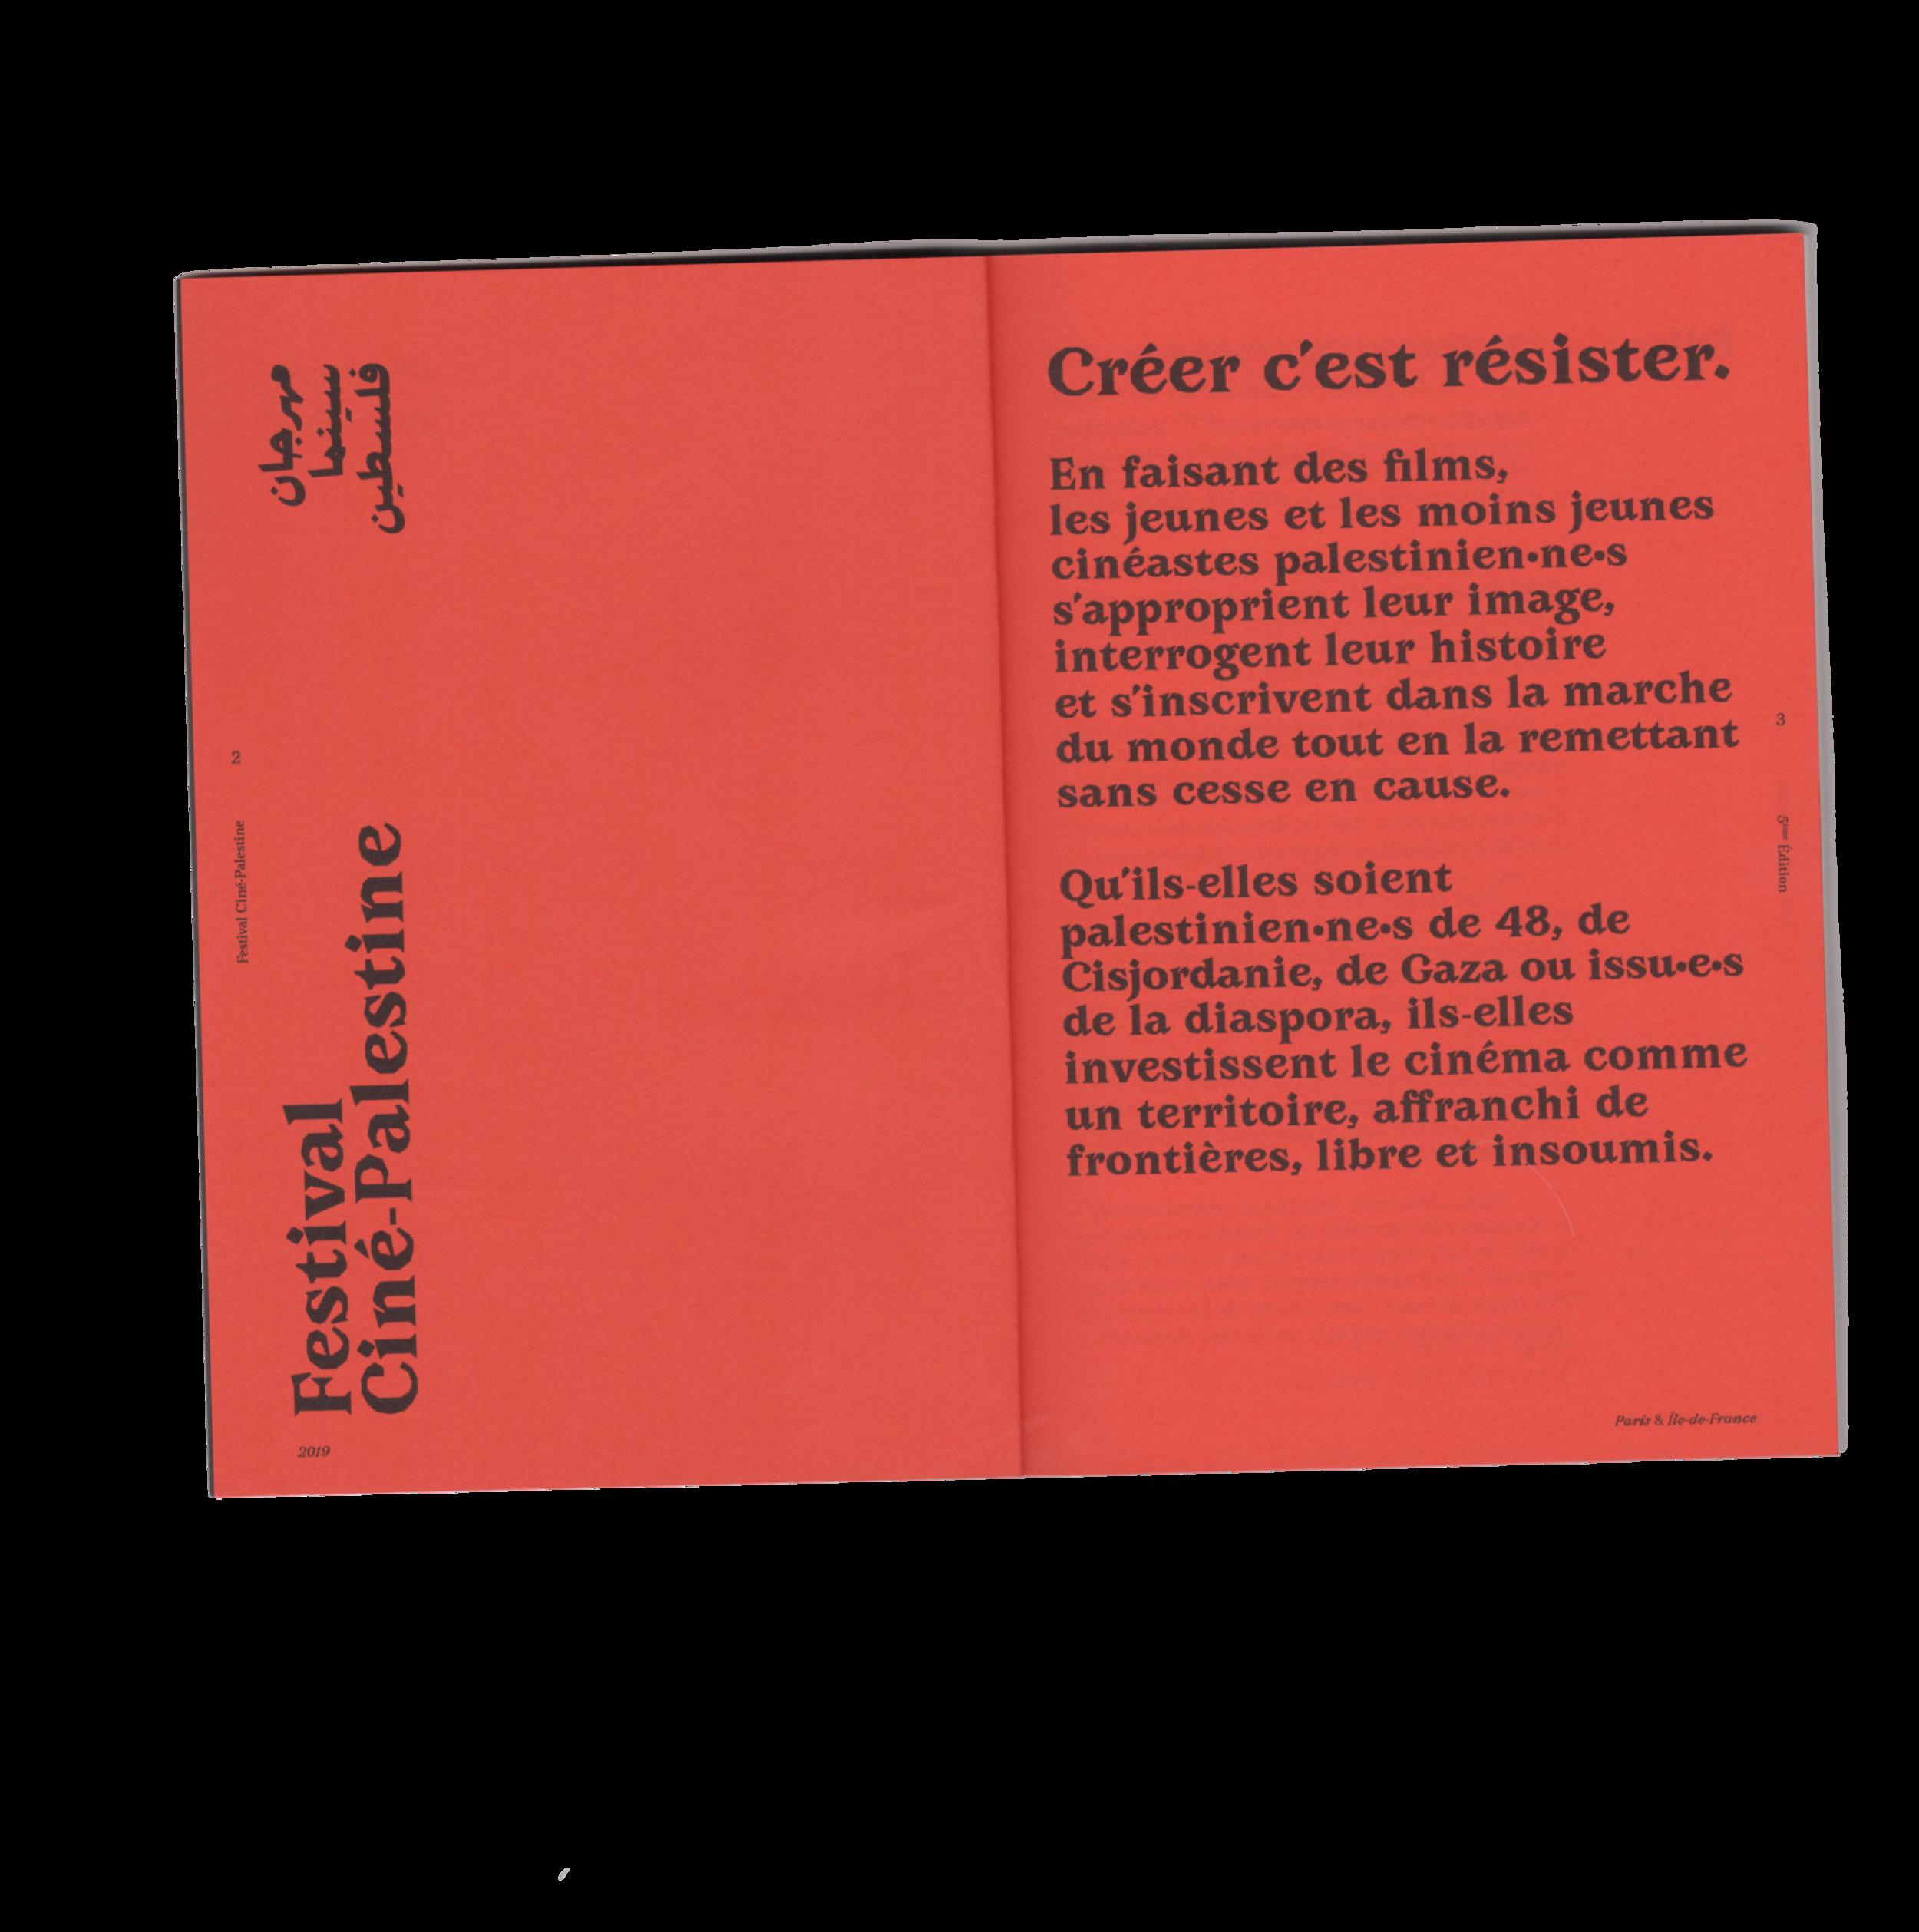 BrochureFCP 8.png